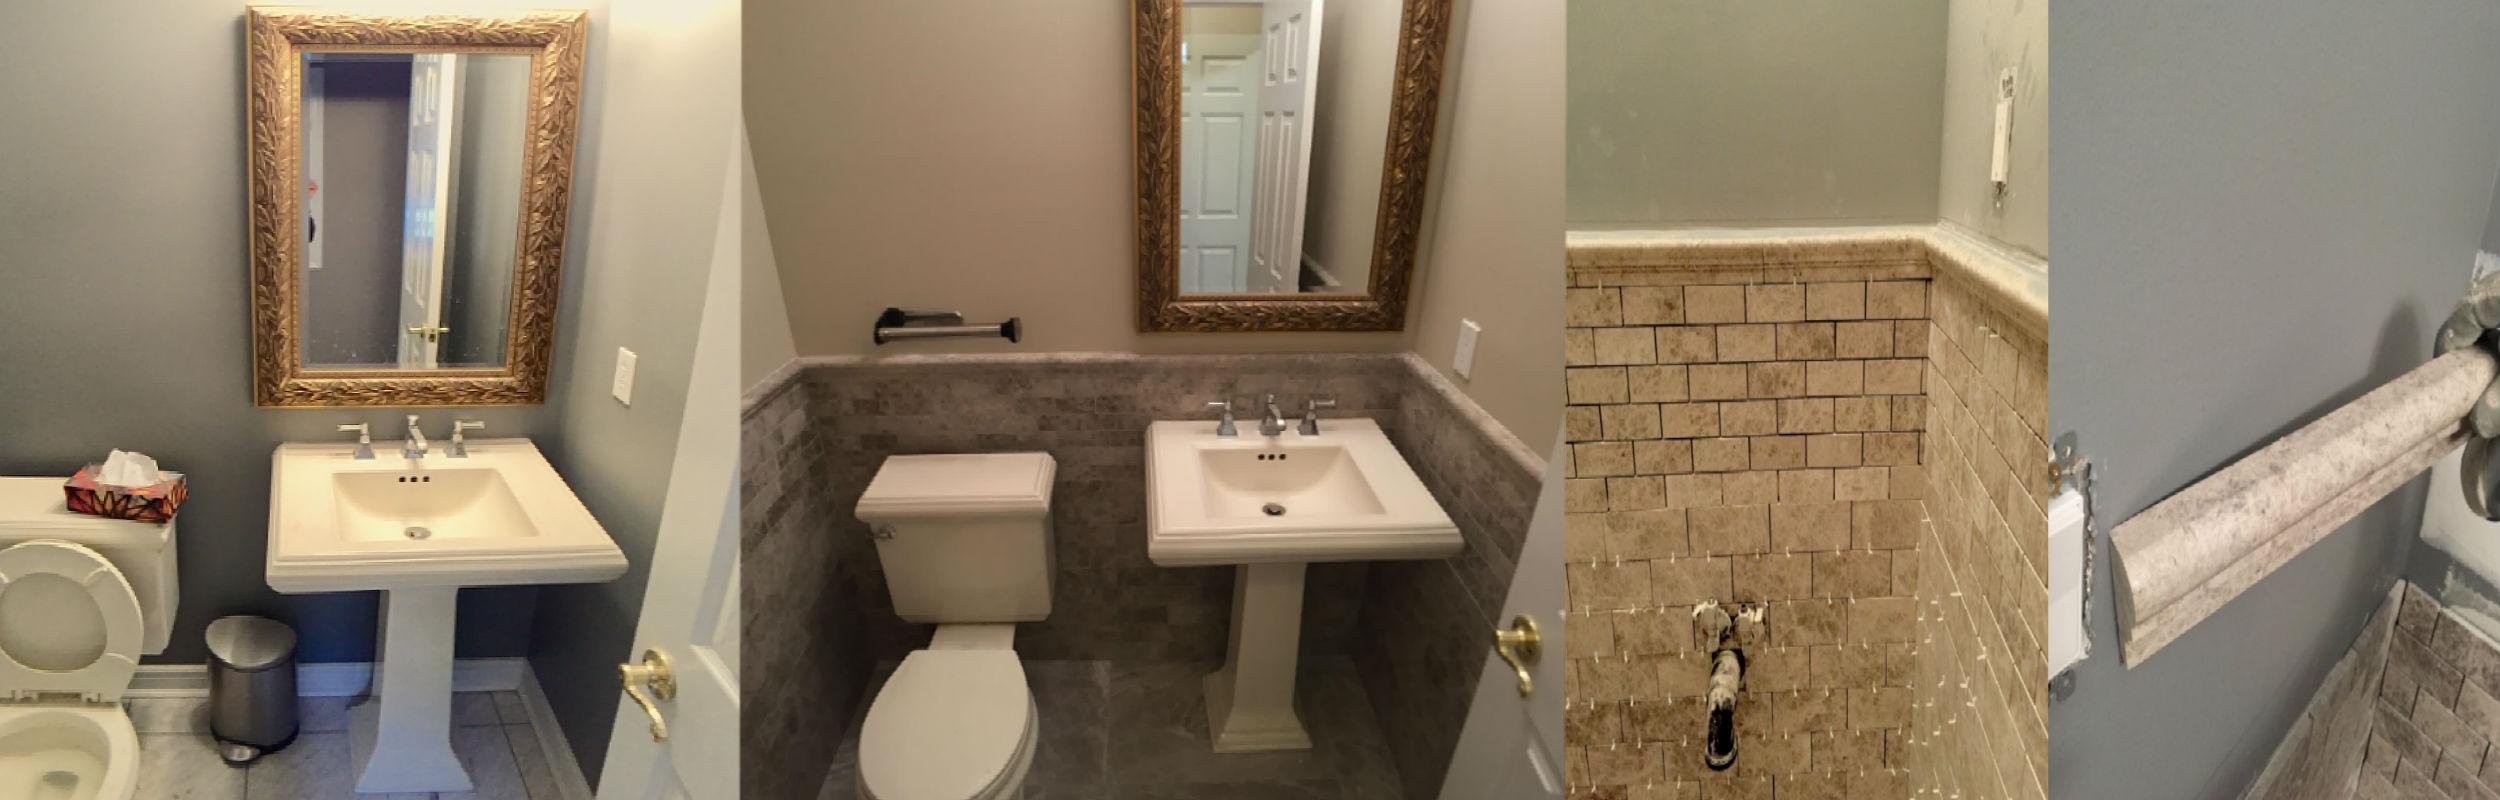 Bathroom Renovation Toronto | Remodeling Markham, North York